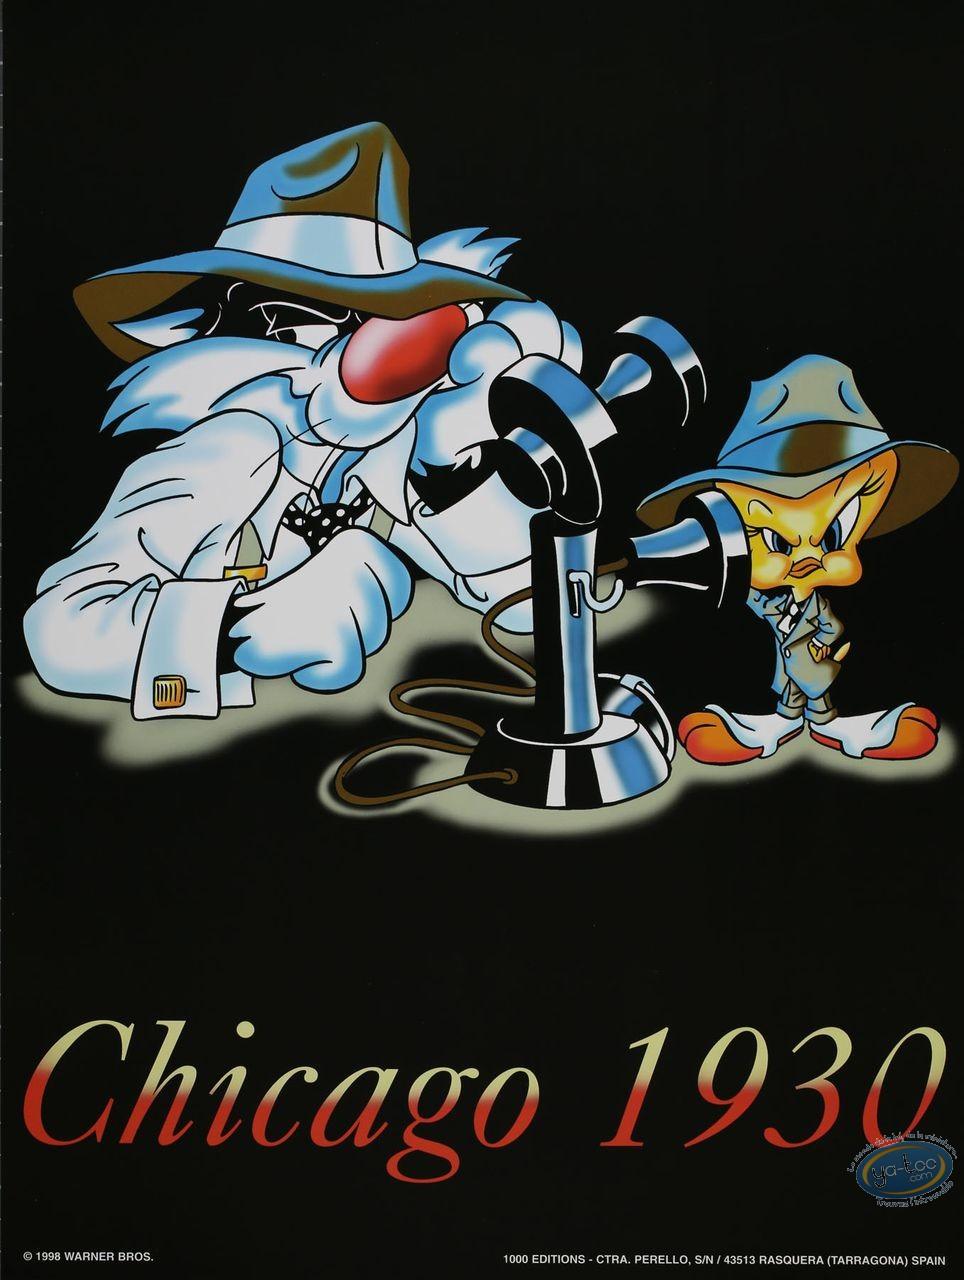 Offset Print, Titi : Chicago 1930 40X30 cm